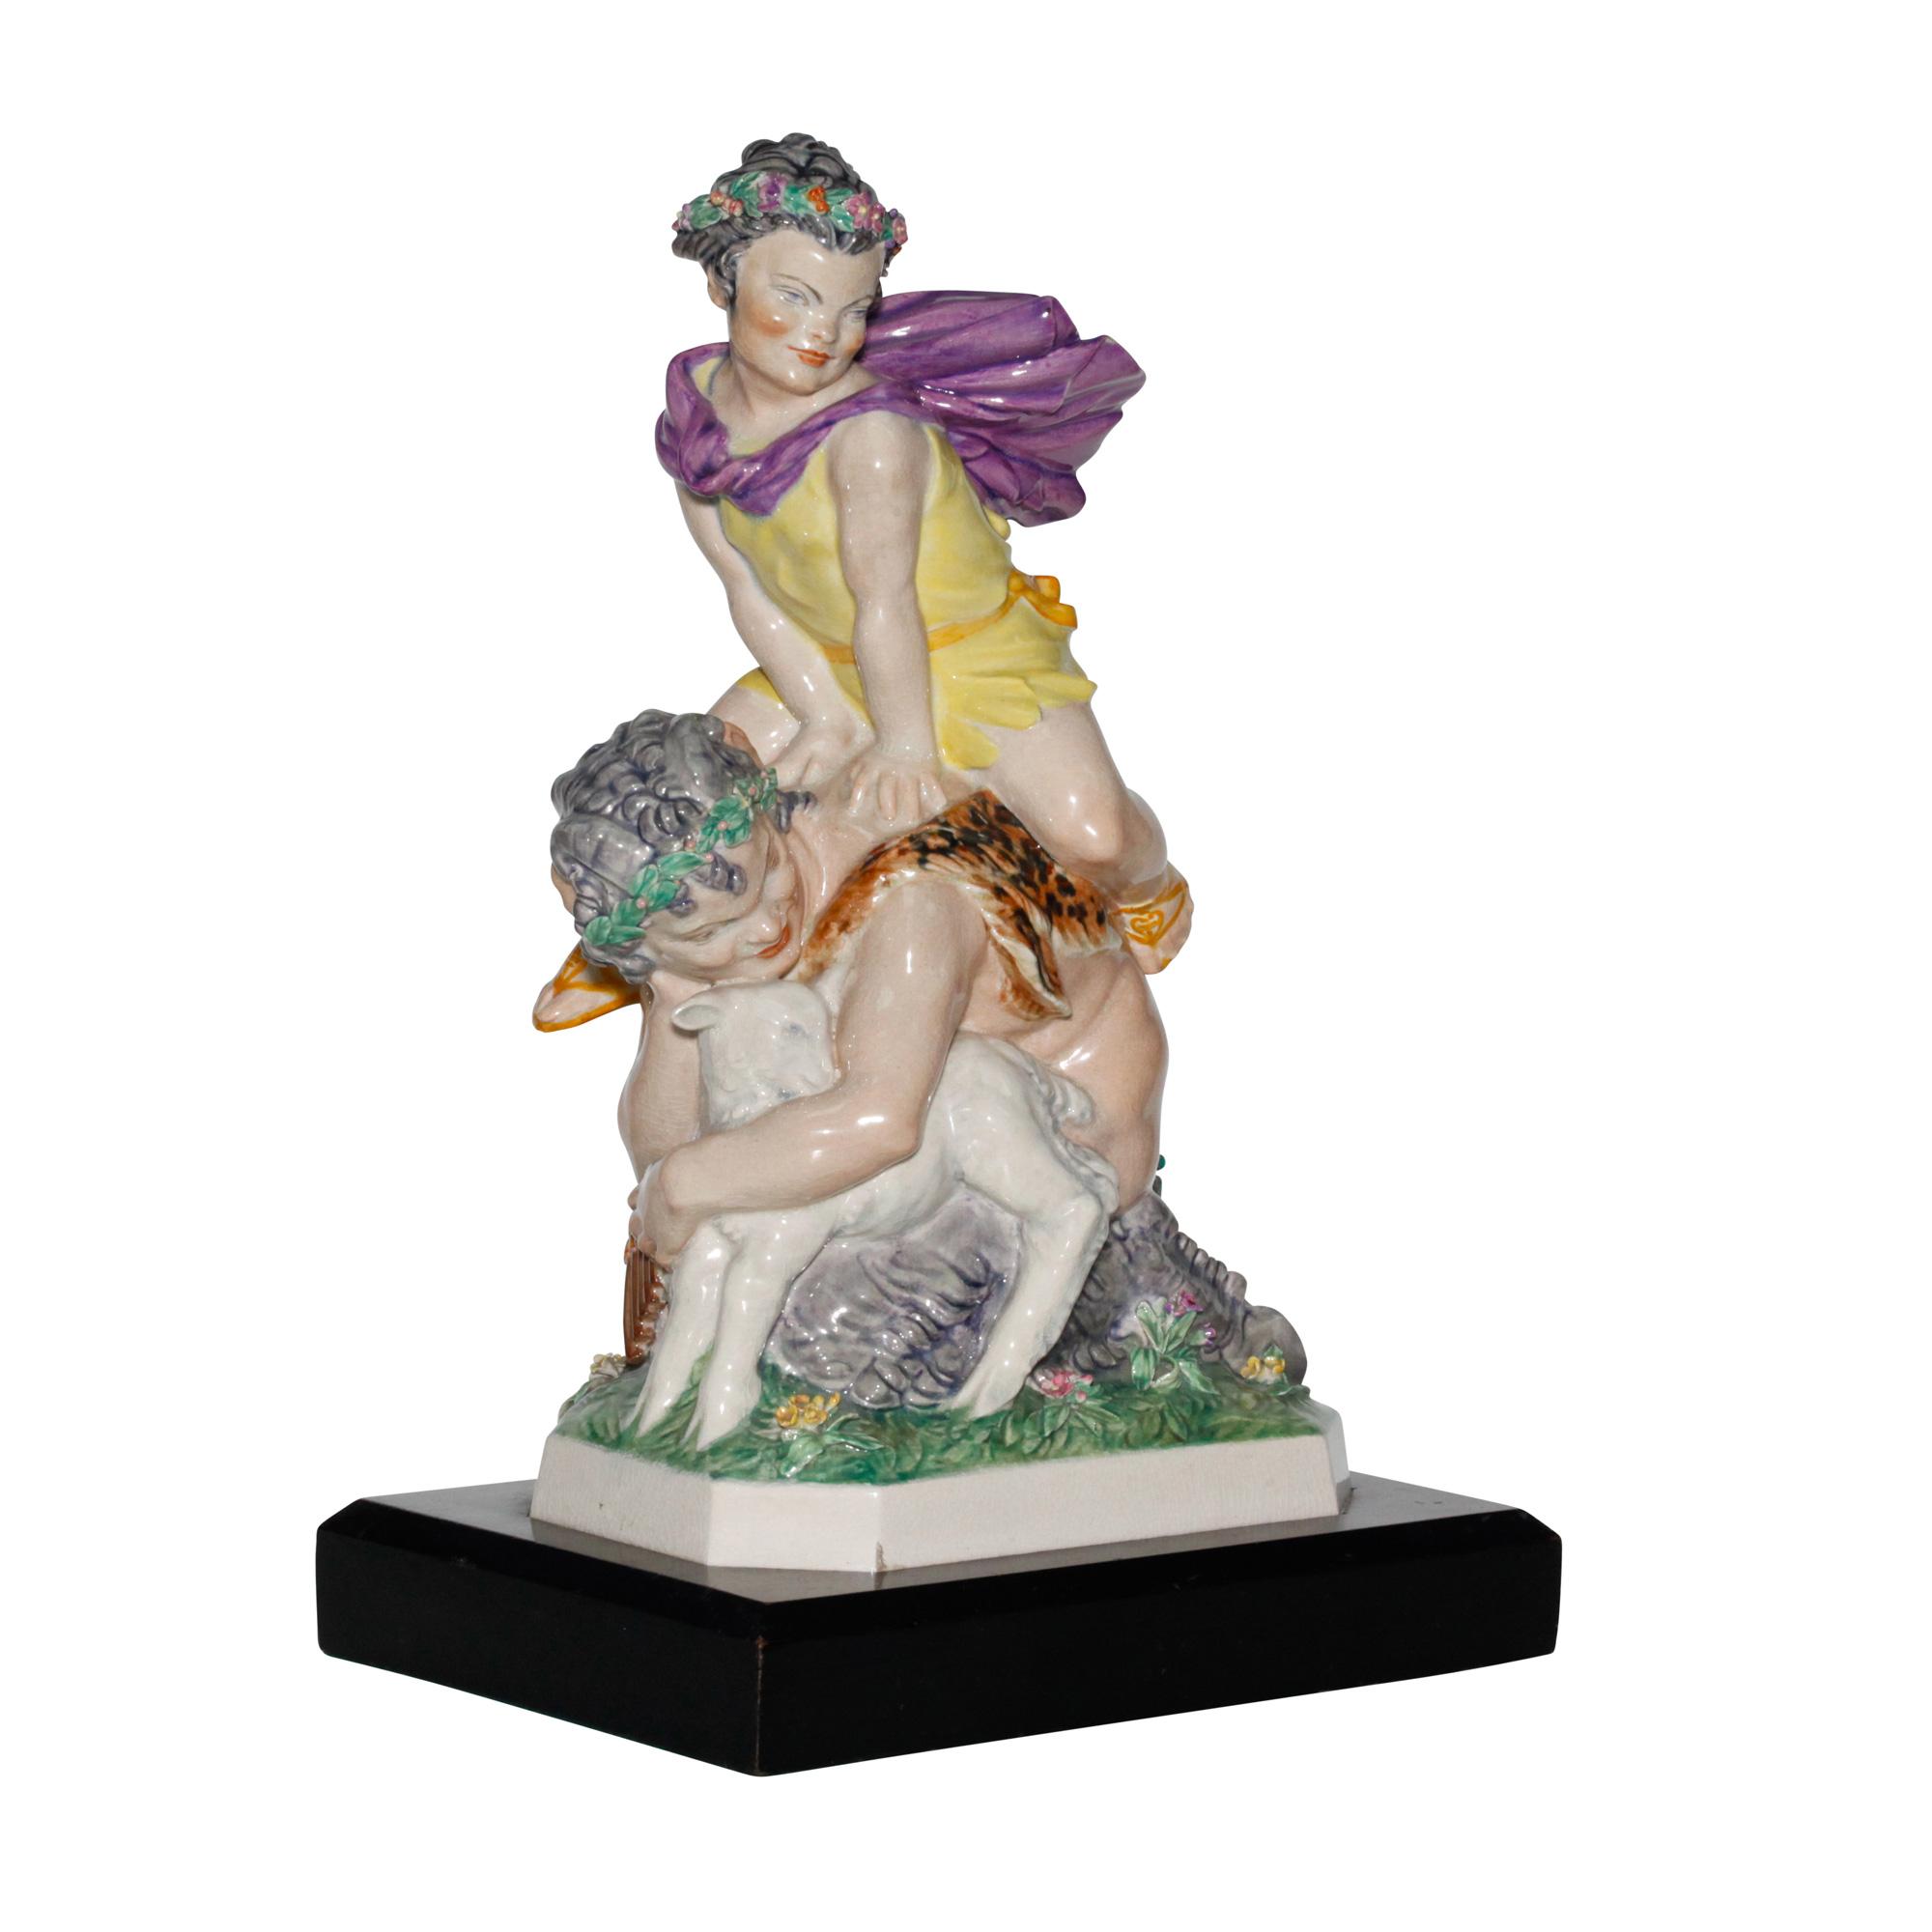 La Folie Bergre Charles Vyse Figurine